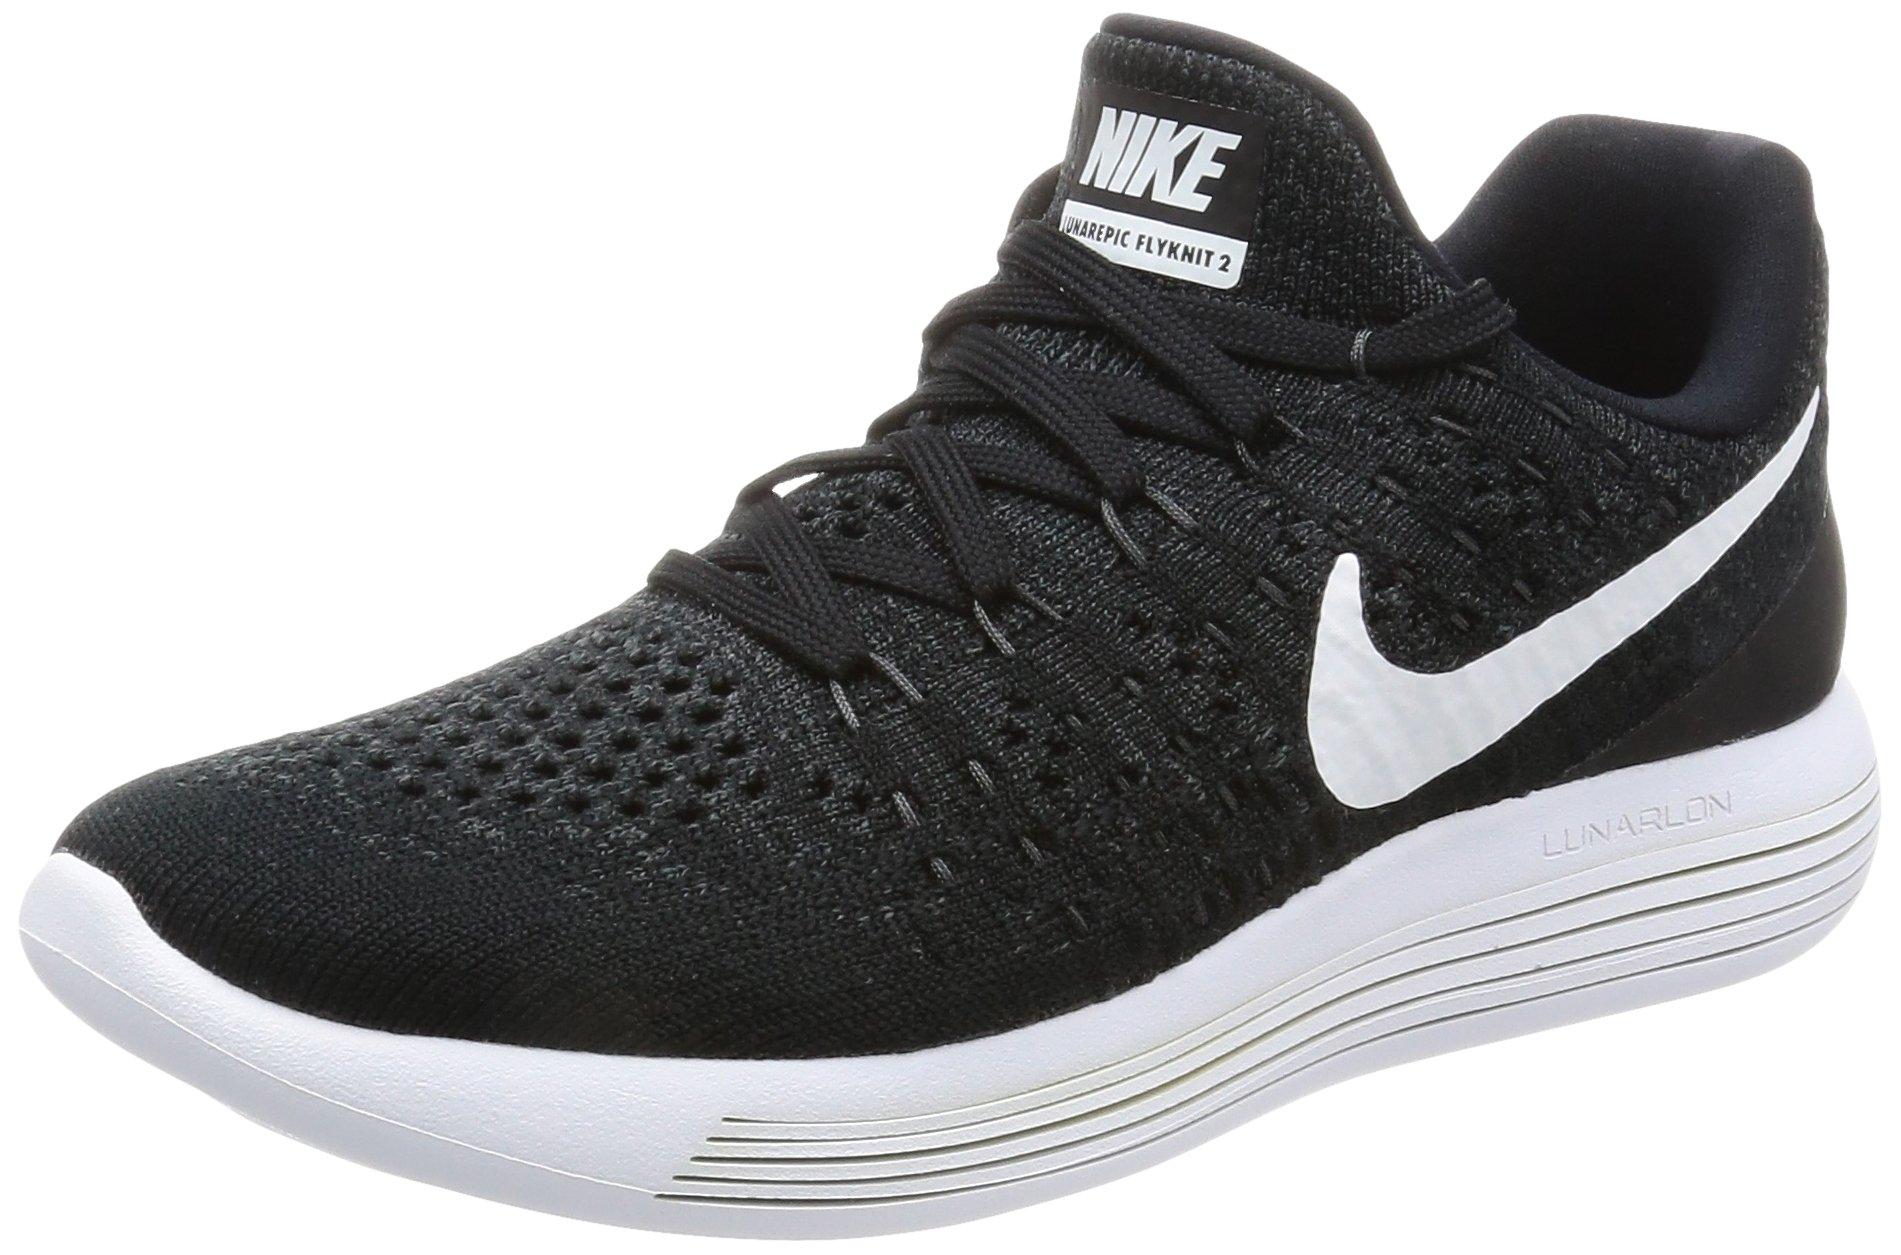 Nike Women Lunarepic Low Flyknit 2 Running (Black/White-Anthracite) Size 5.5 US